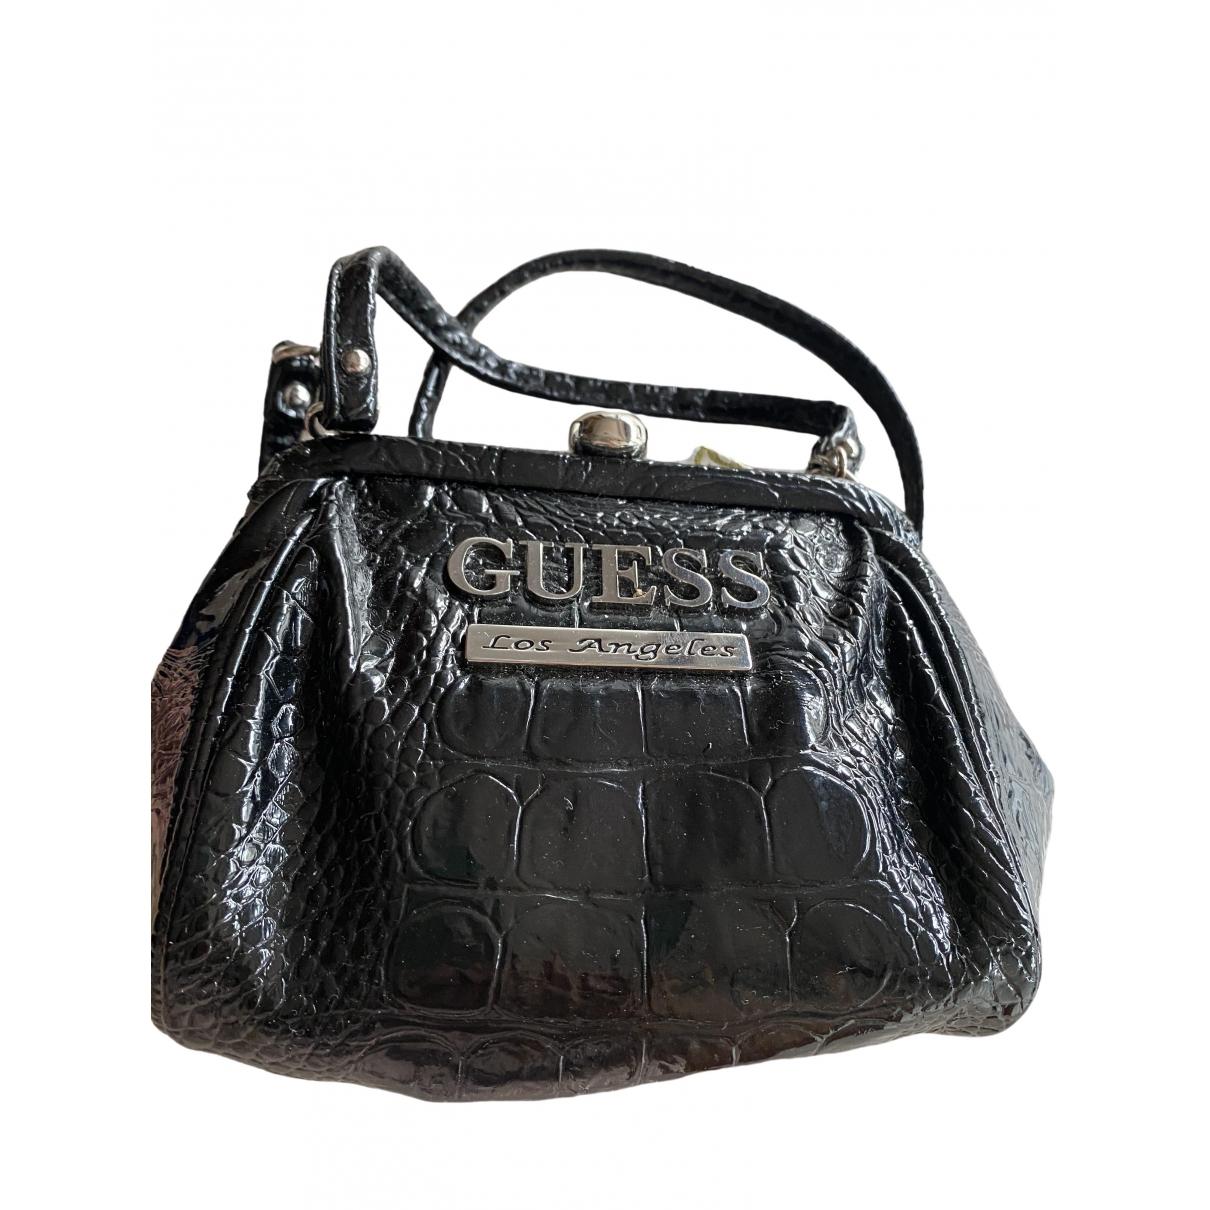 Guess \N Black Patent leather handbag for Women \N